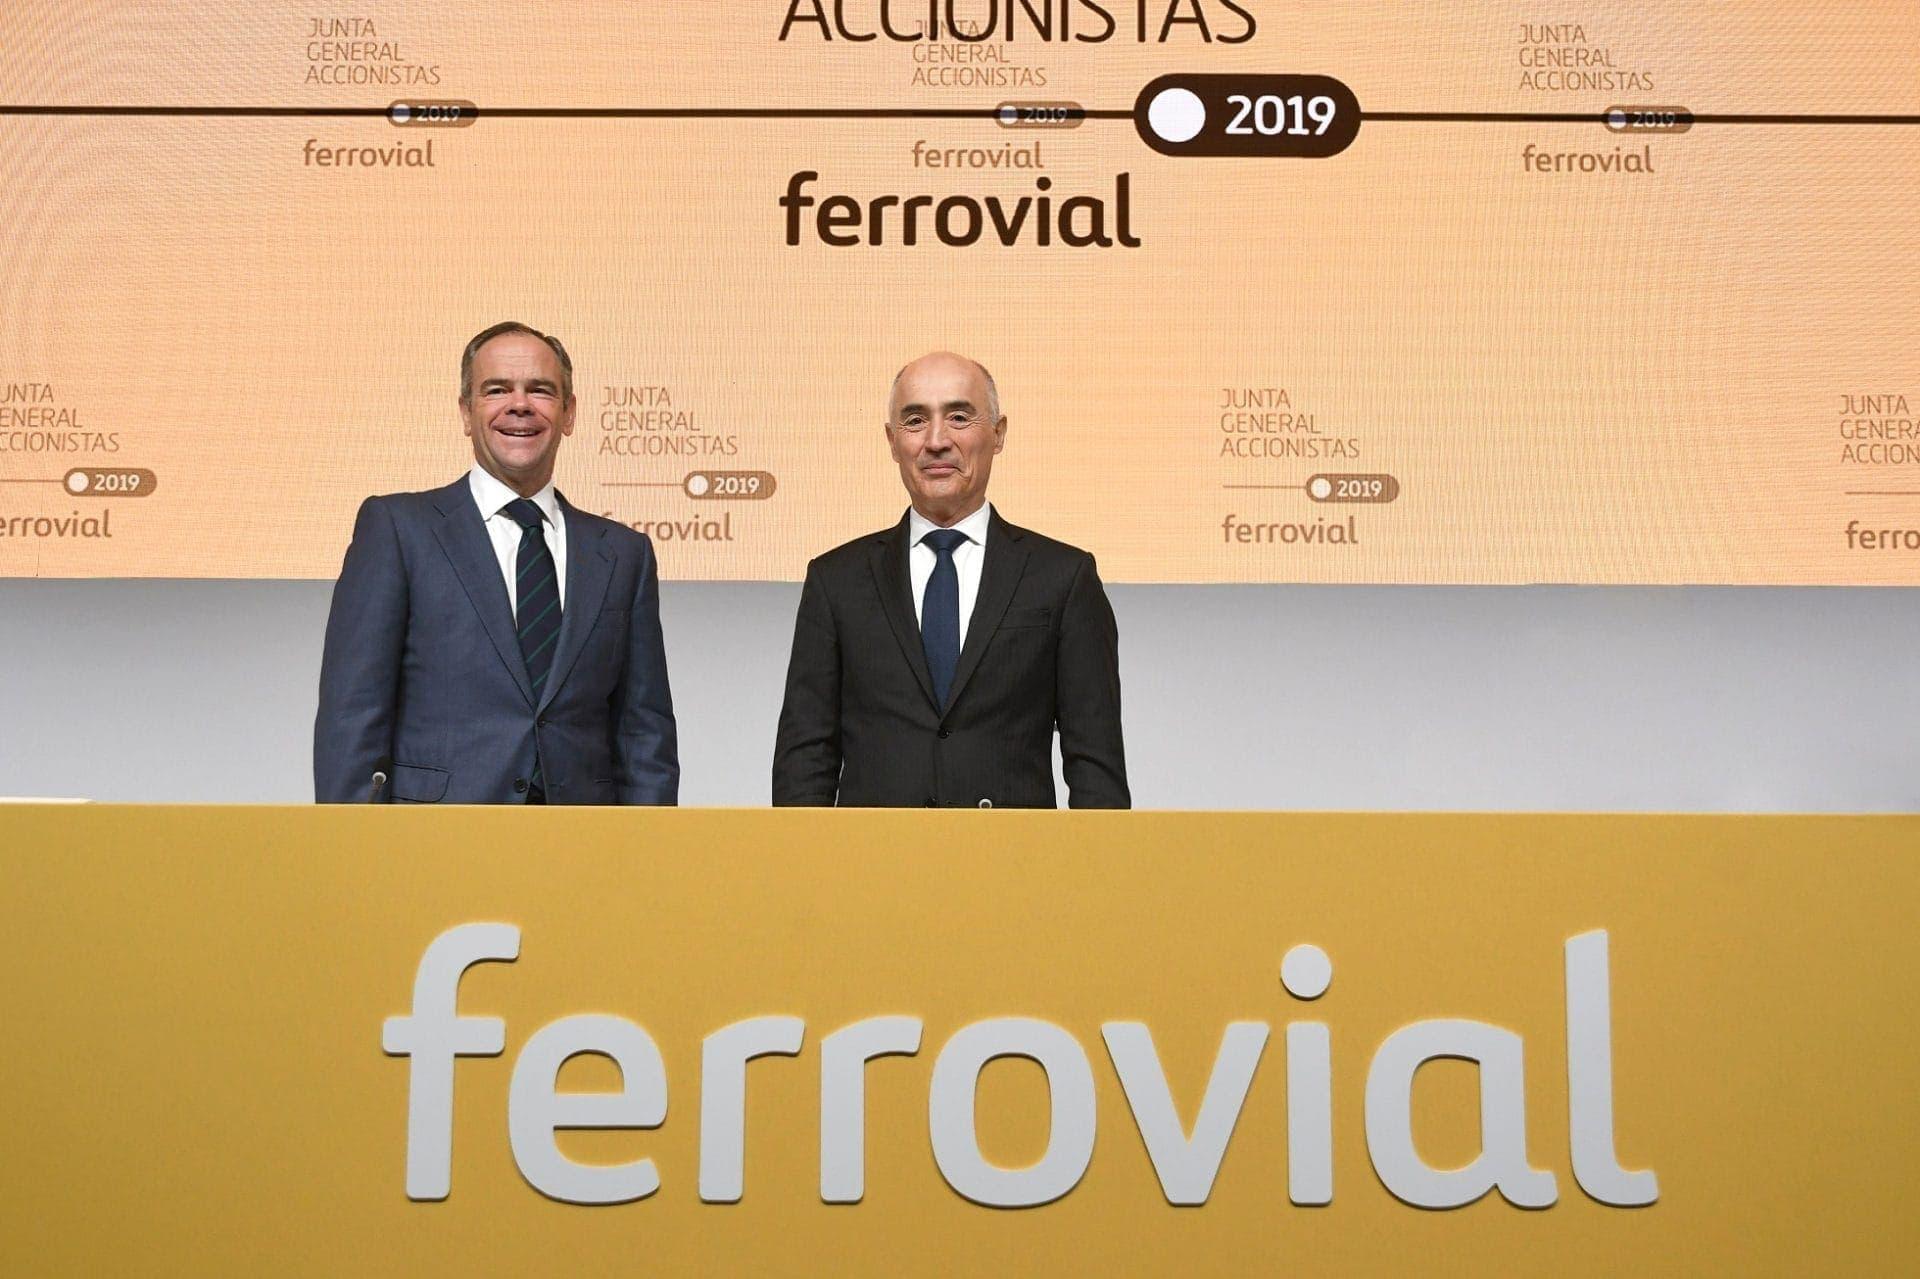 Íñigo Meirás and Rafael del Pino at the Annual Shareholders' Meeting 2019